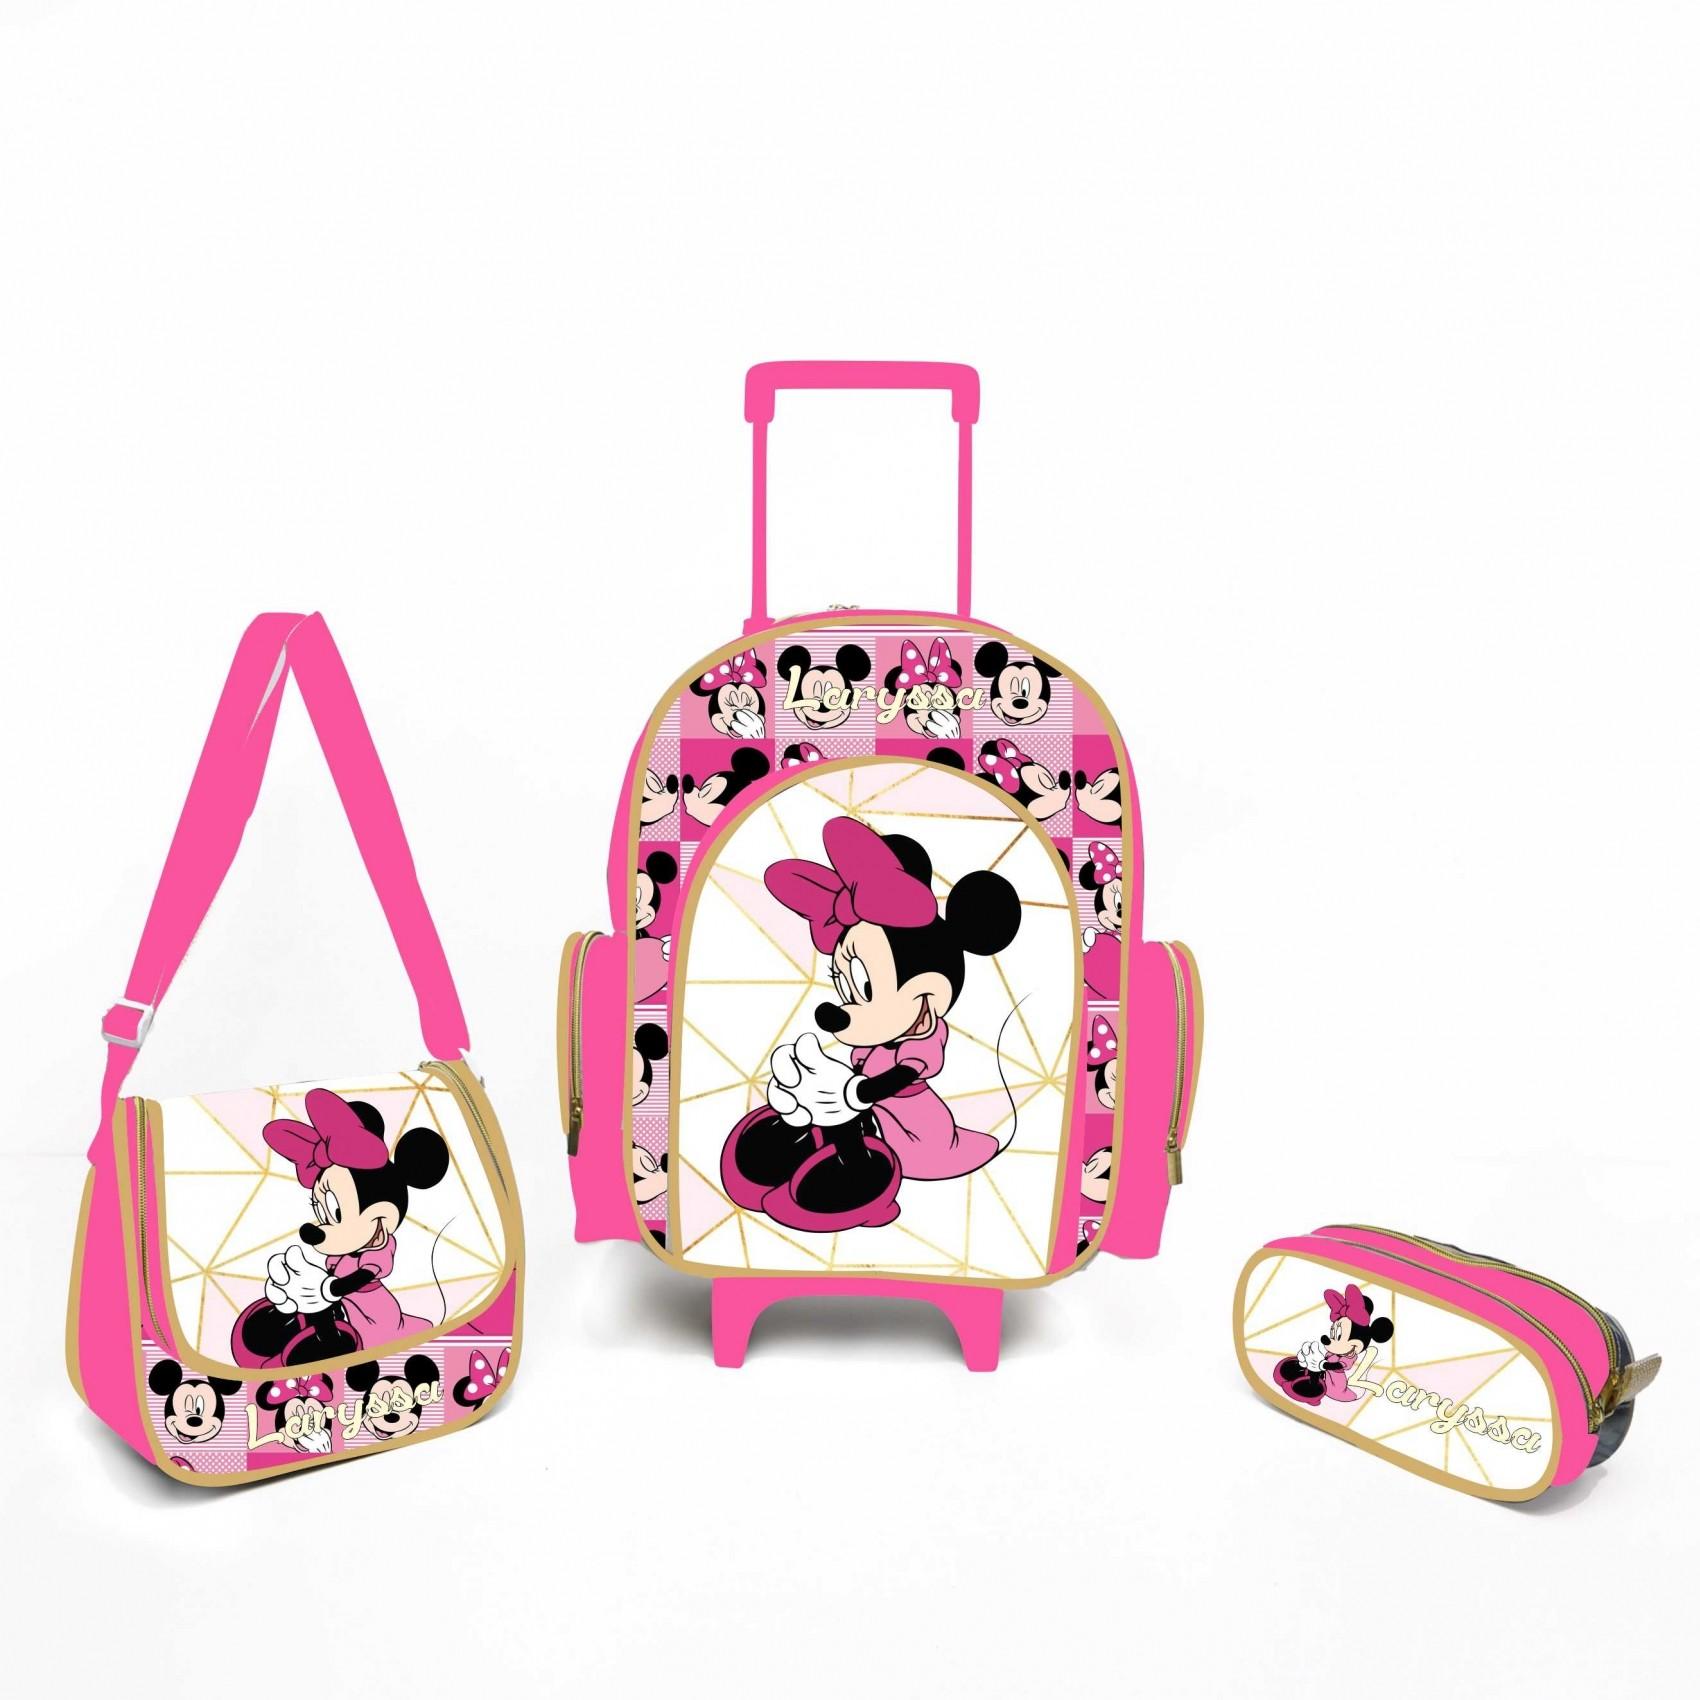 c46abf48d Comprar Kit Escolar personalizado Minnie Rosa - Bolsas, Mochilas ...